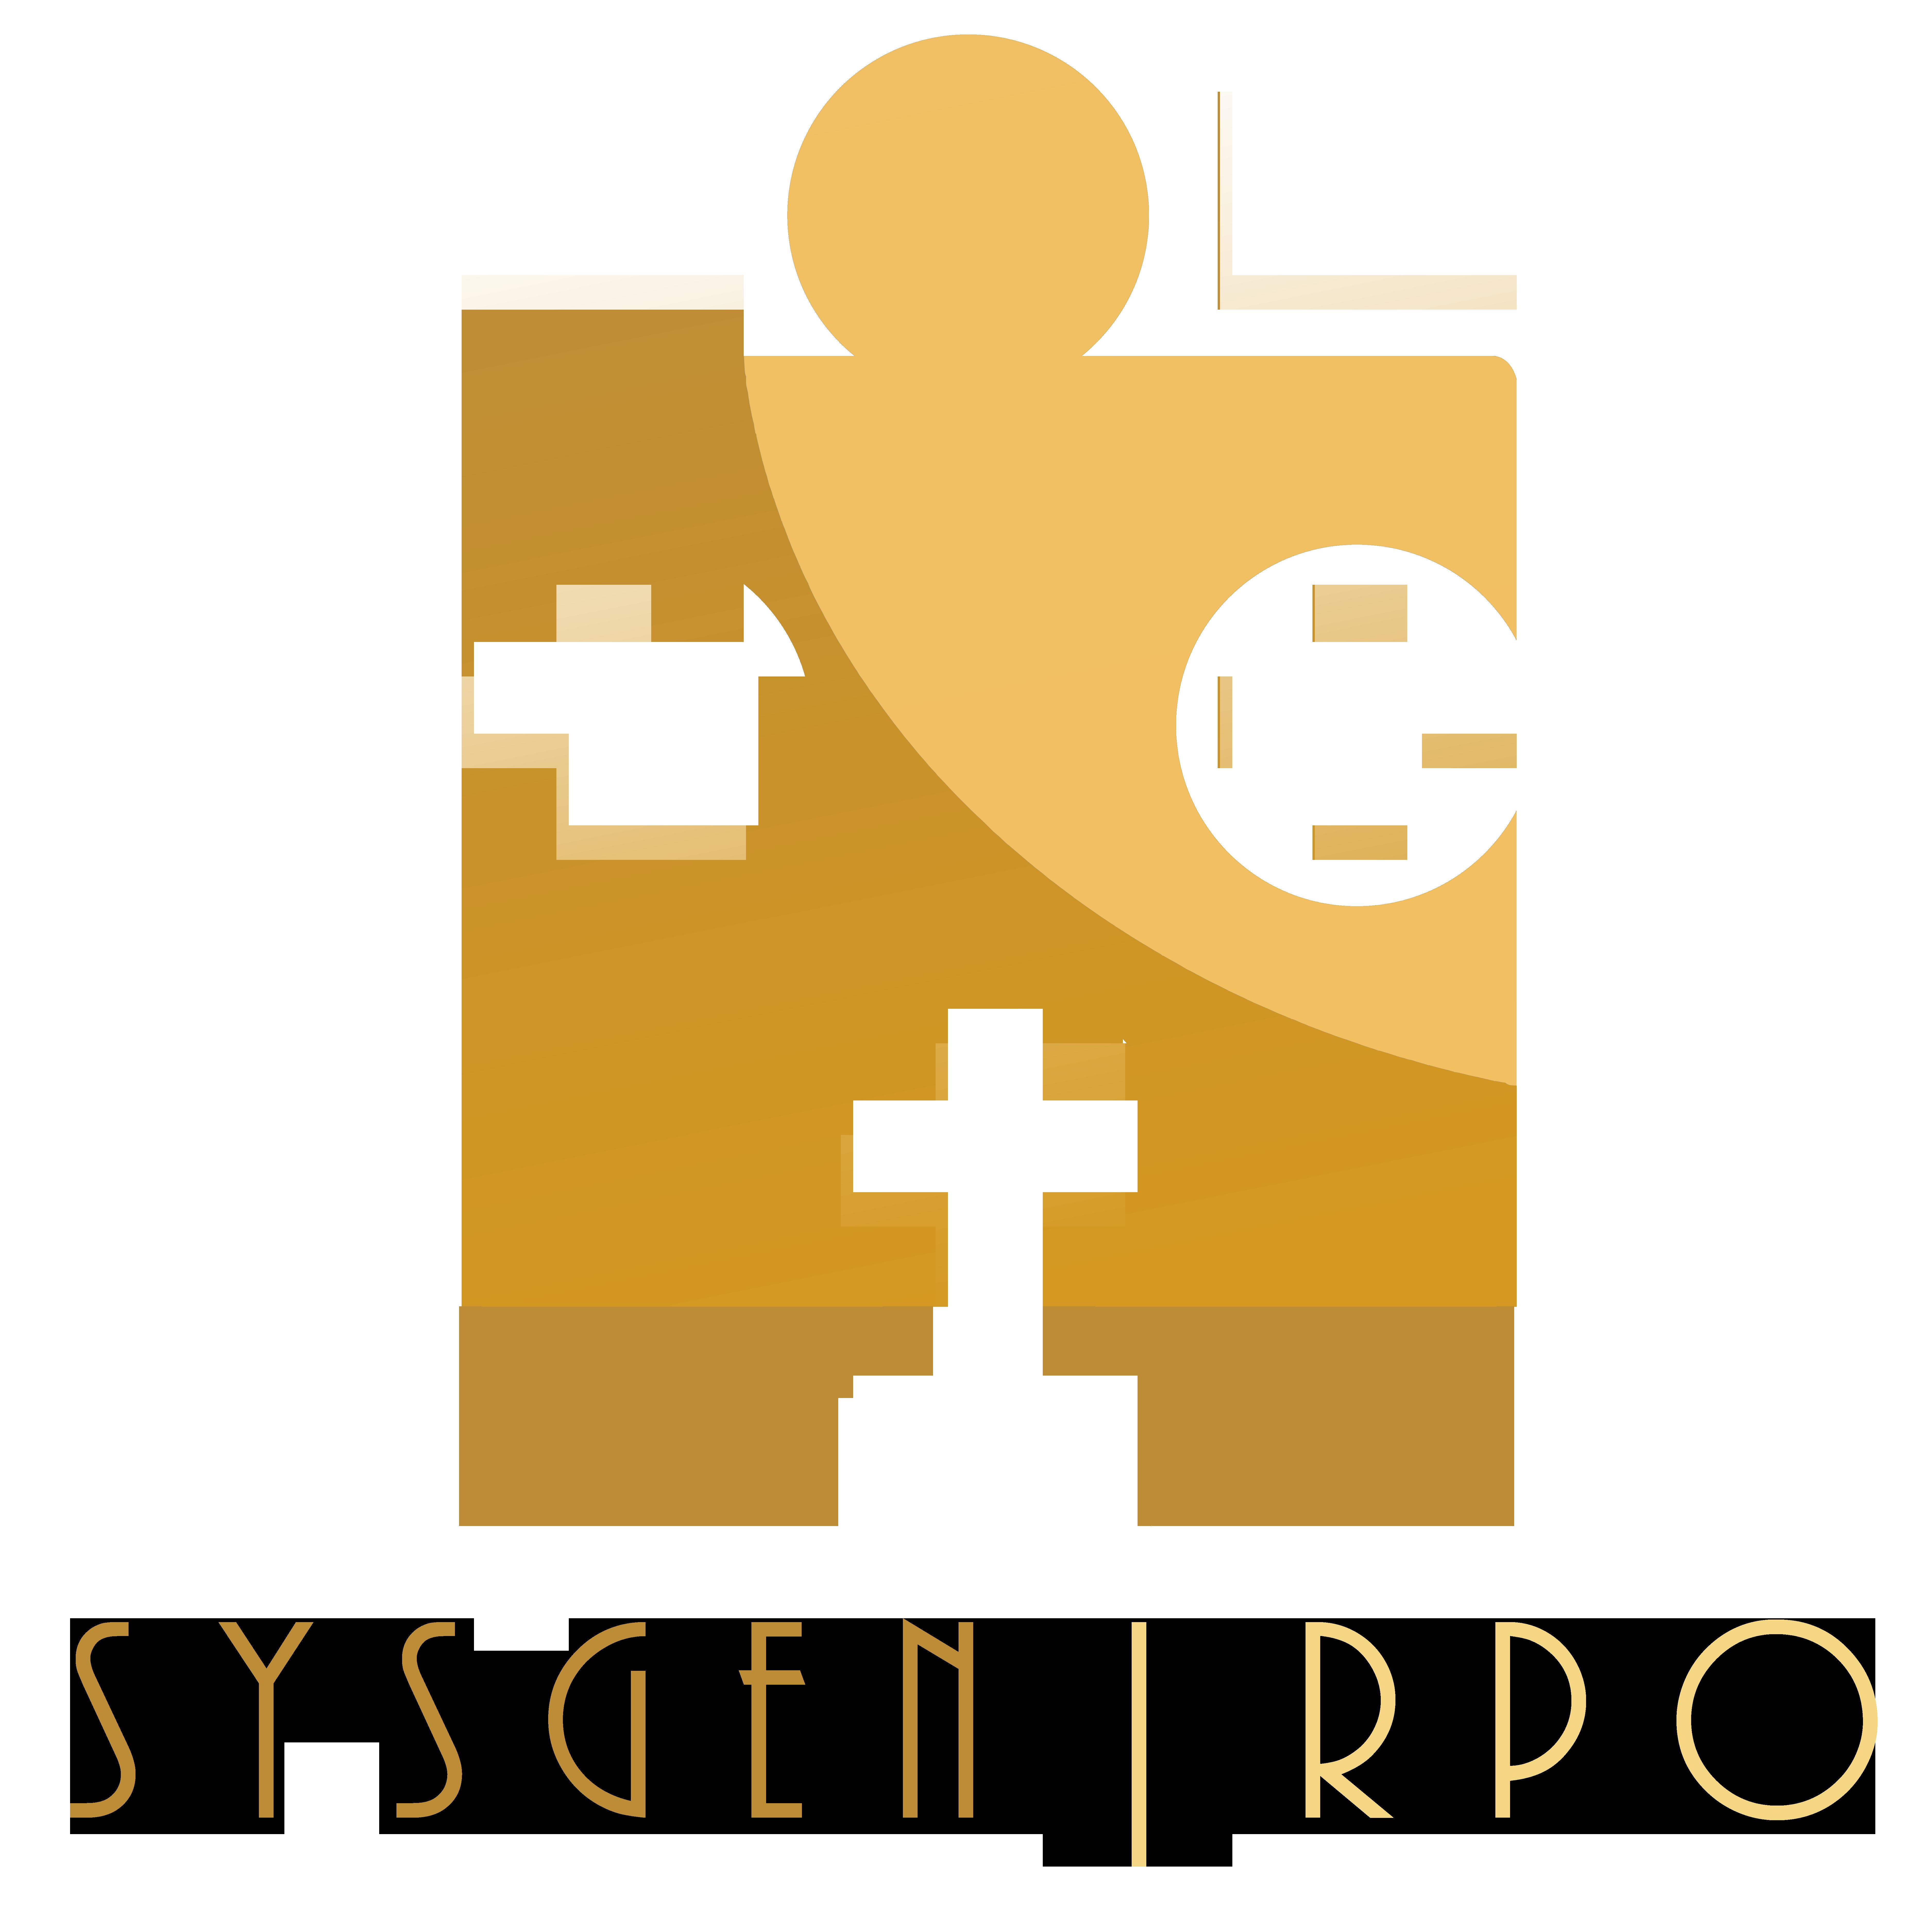 Sysgen RPO logo